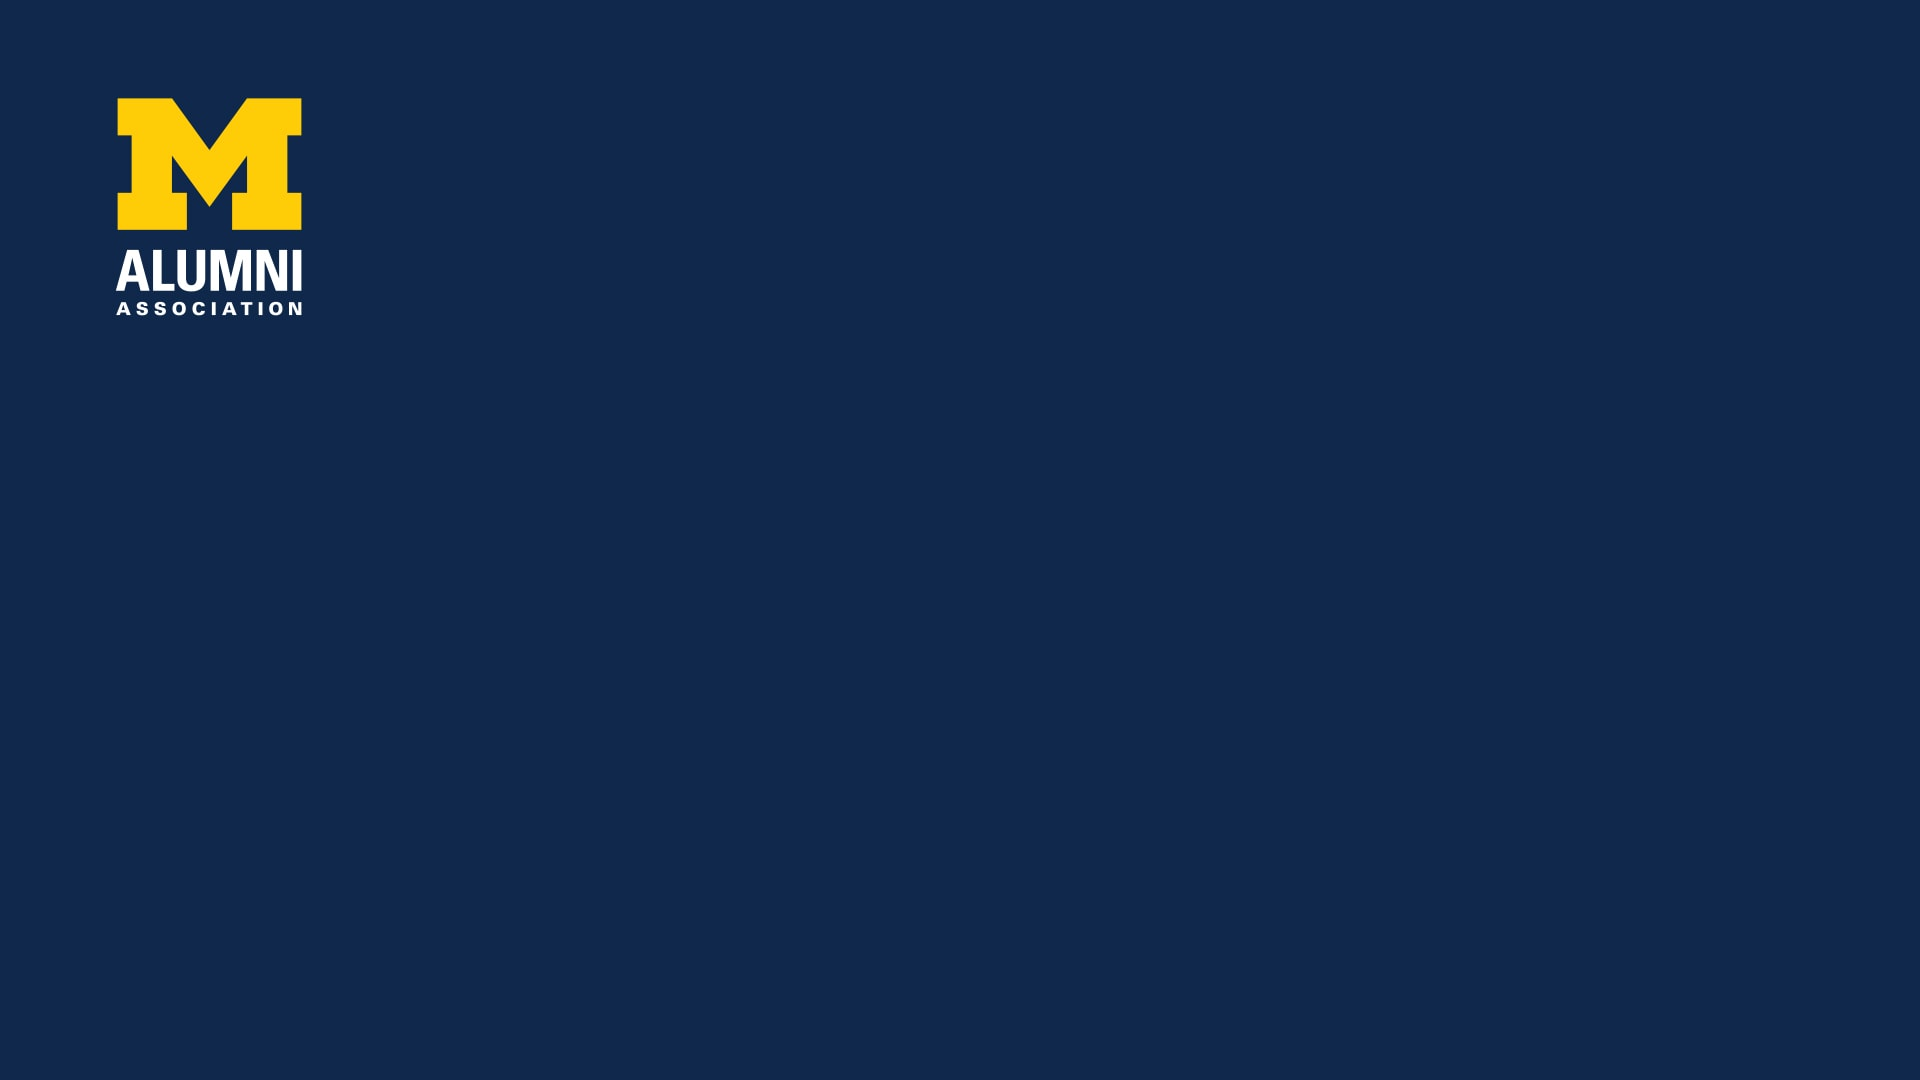 Alumni Association logo on a navy background